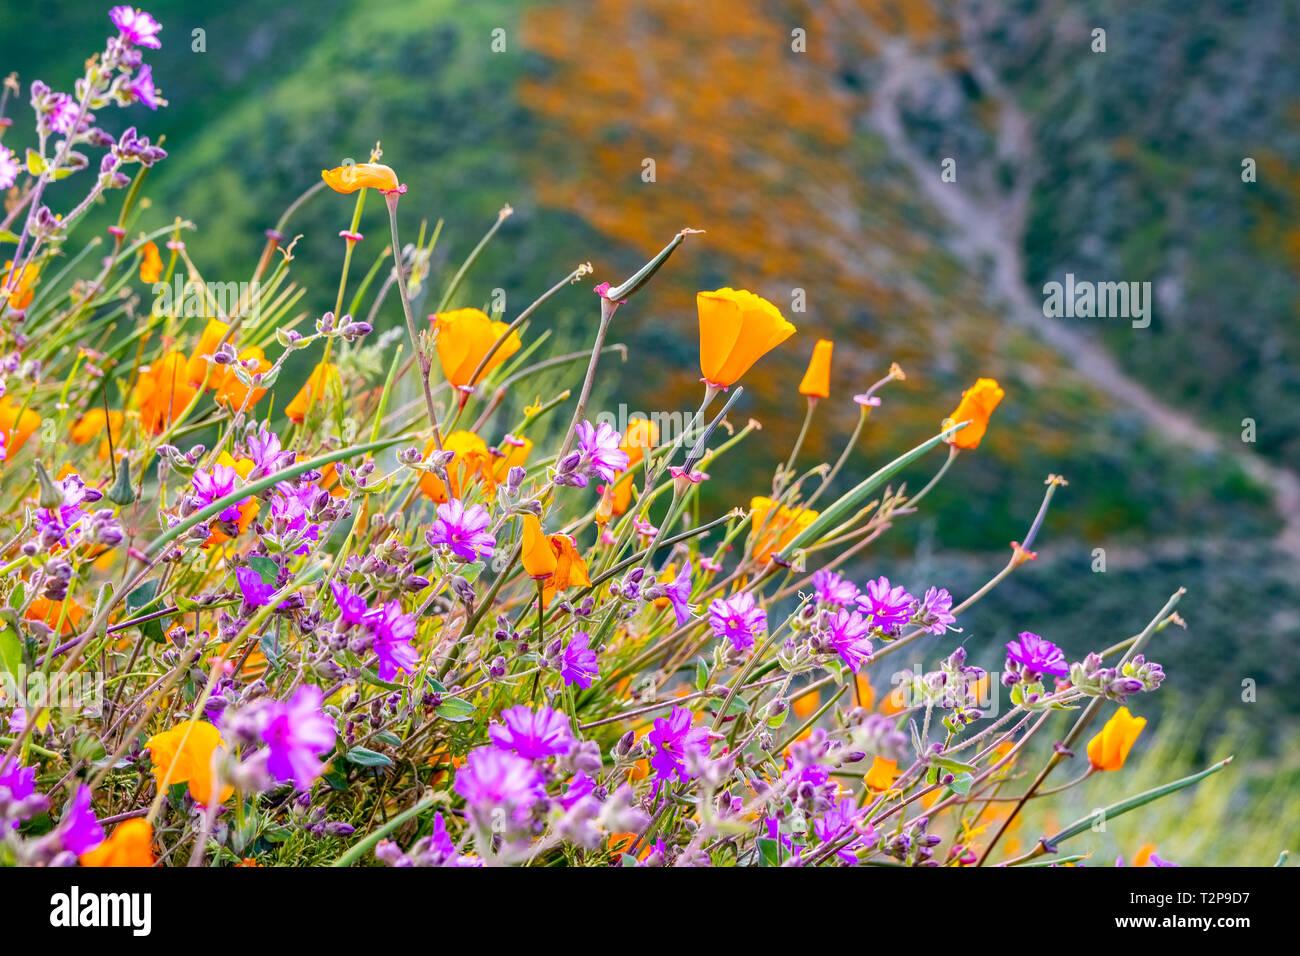 California poppies (Eschscholzia californica) and Desert wishbone bush (Mirabilis laevis) wildflowers blooming in Walker Canyon, Lake Elsinore, Califo Stock Photo